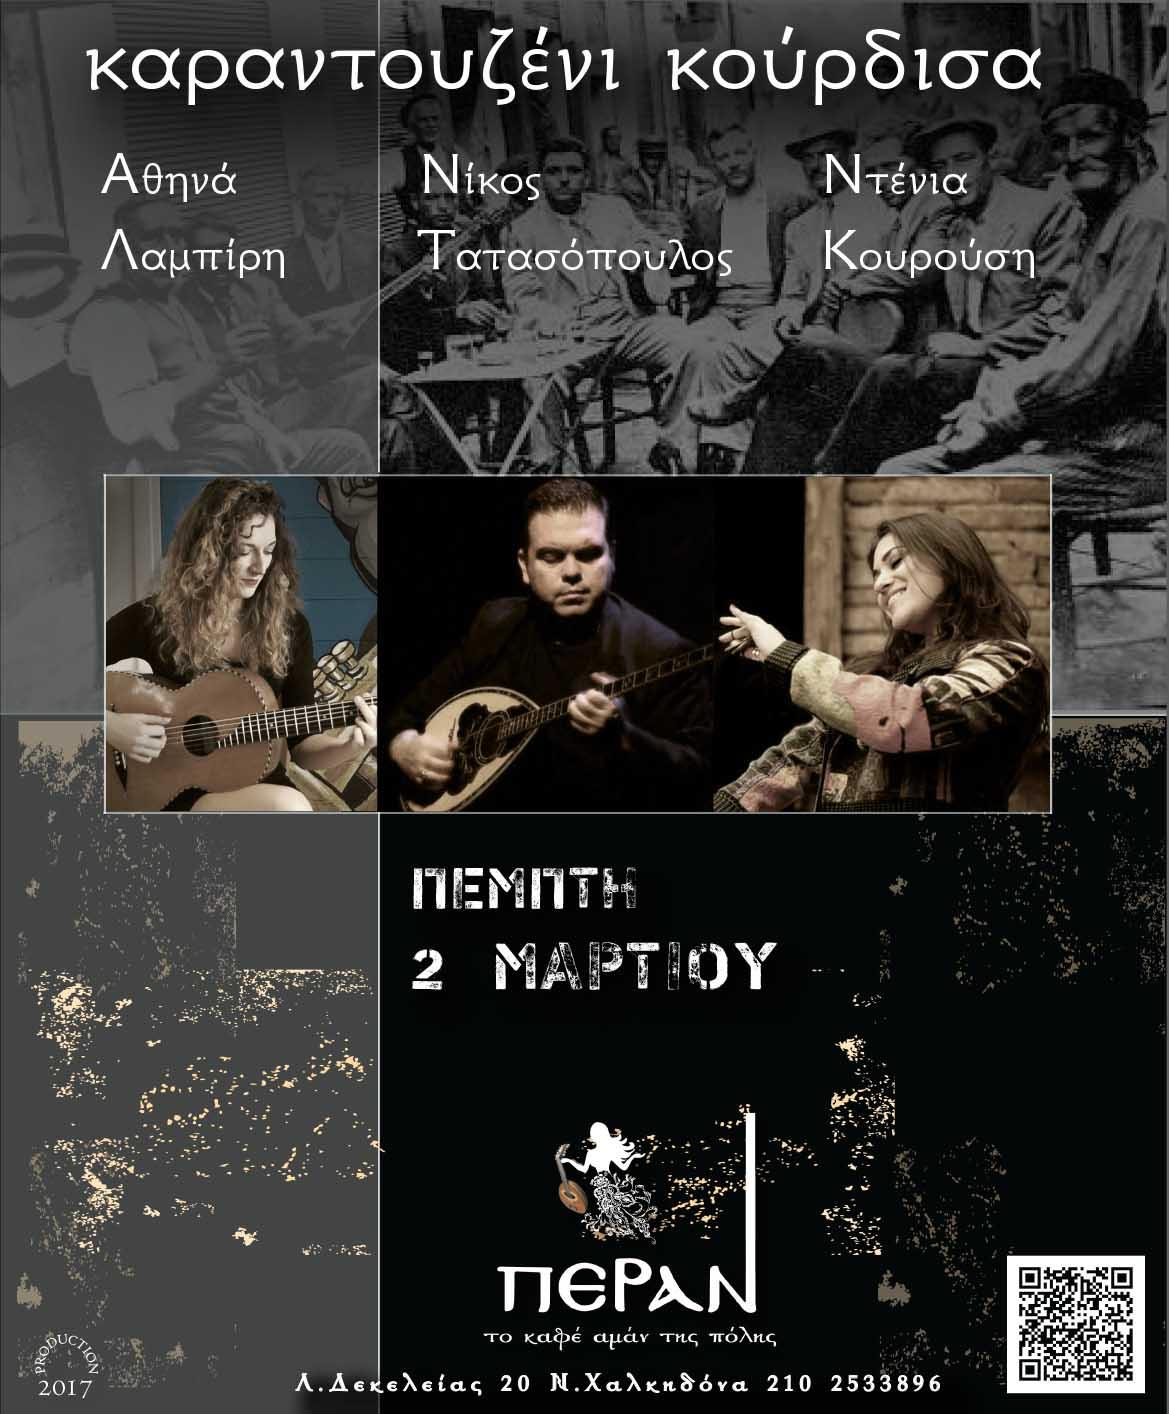 TATASOPOYLOS-KOYROYSI 2-3